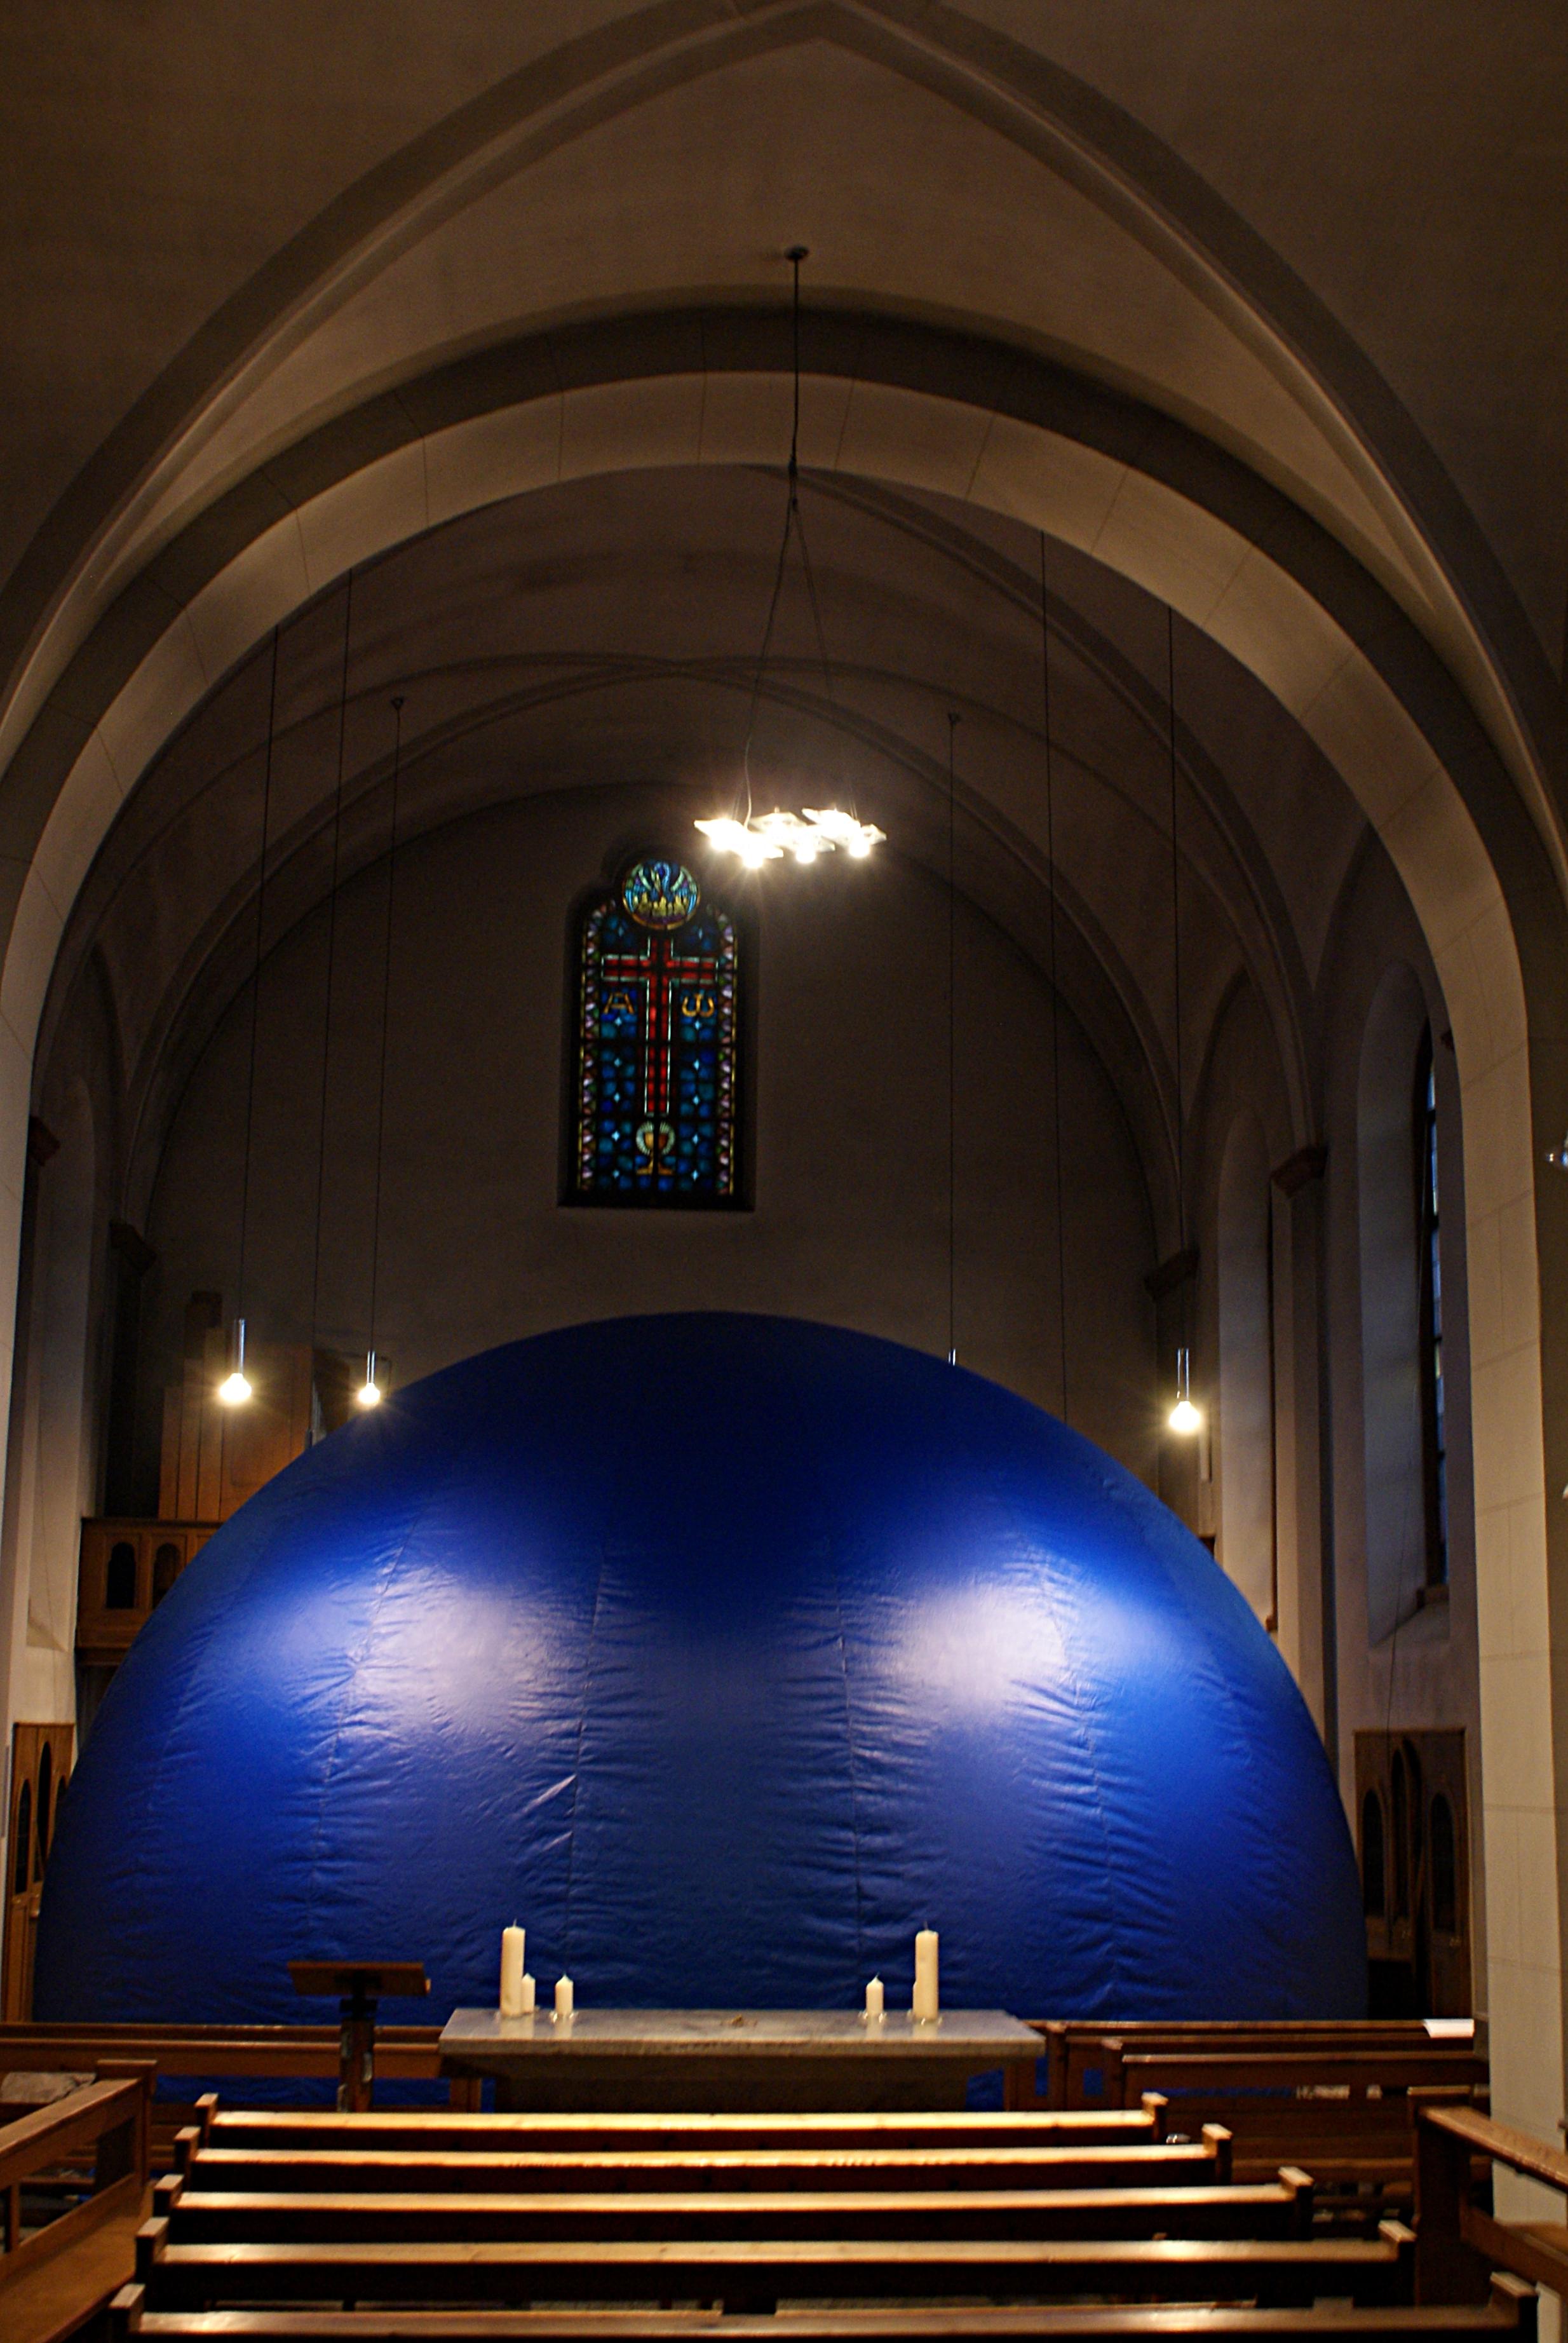 Fulldome Cinema im ehem. Kapuziner Kloster in Dieburg. Bild: Natascha Rehberg